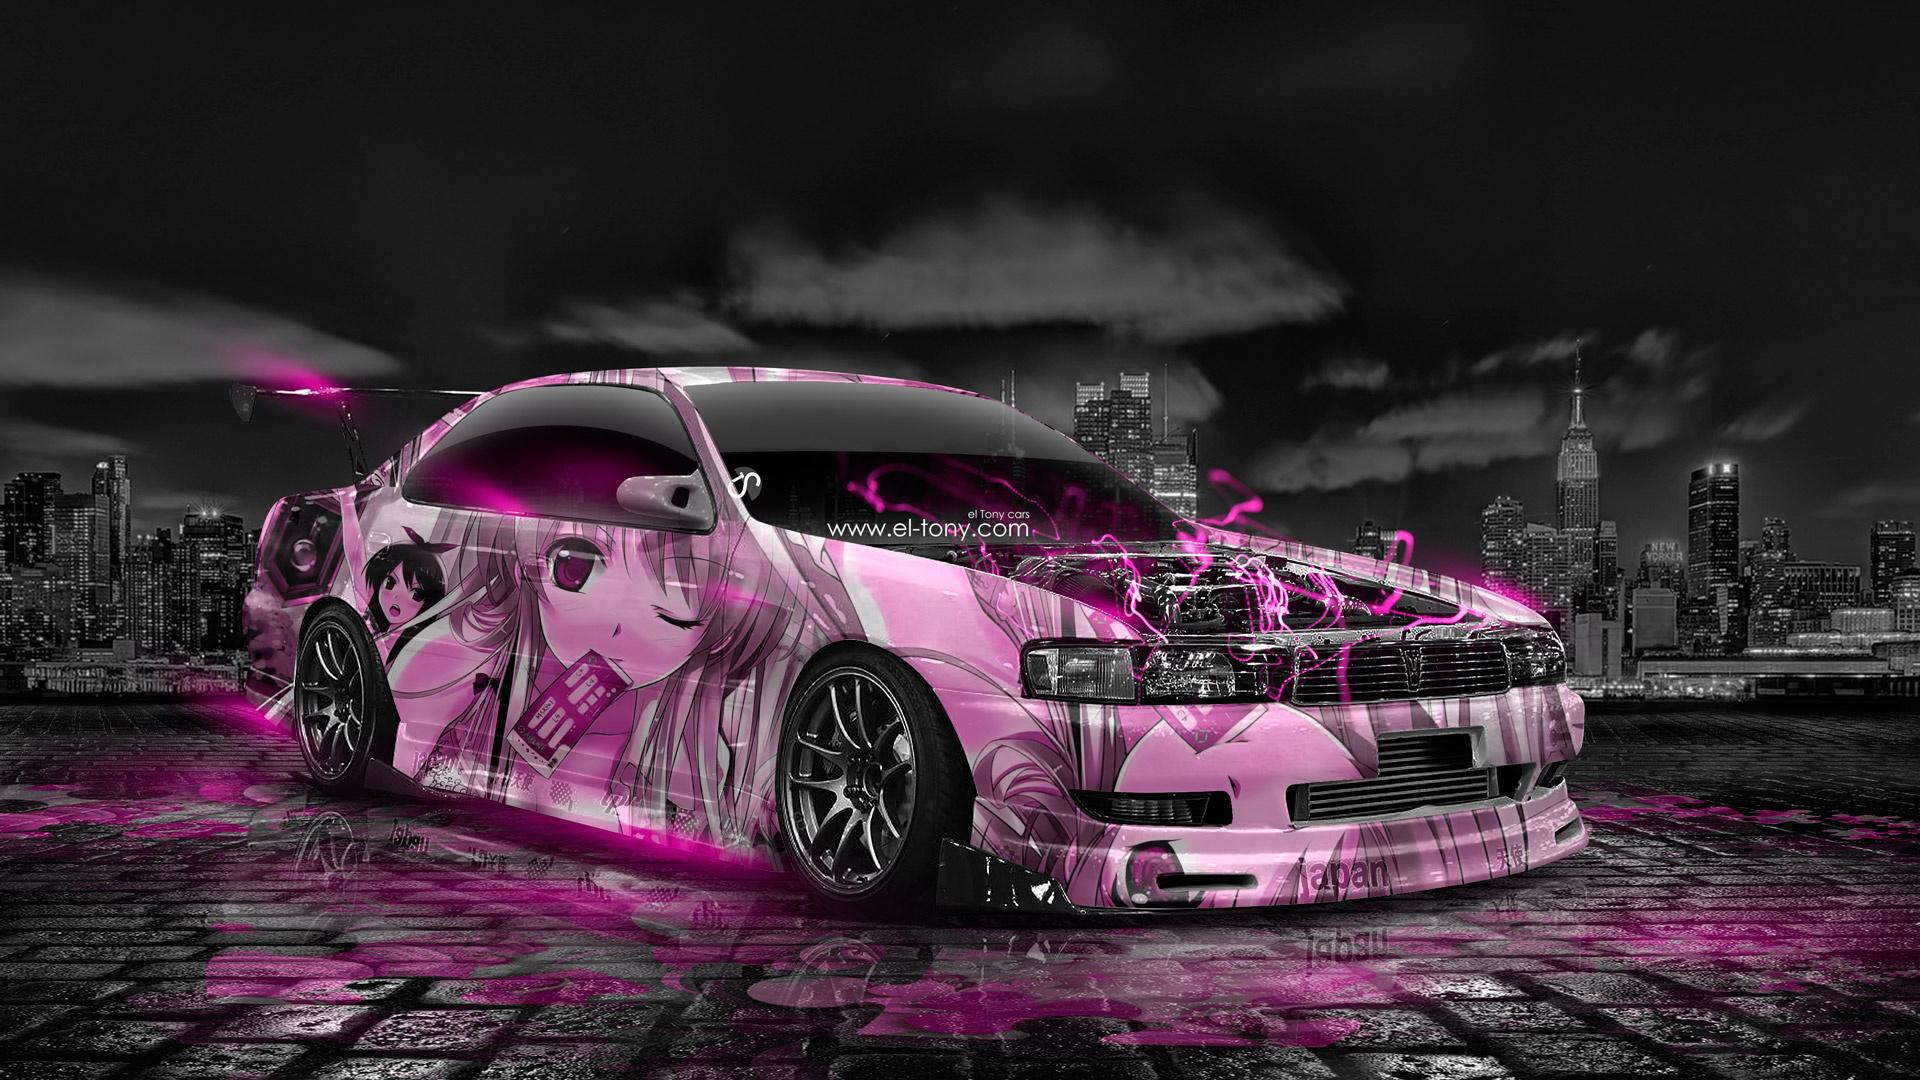 tony kokhan, toyota, chaser, jzx90, jdm, anime, girl, aerography, city, japan, pink, neon, effects, car, tuning, el tony cars, photoshop, design, art, style, hd wallpapers, тони кохан, фотошоп, тойота, Чайзер, аниме, анимэ, аэрография, город, ночь, розовы